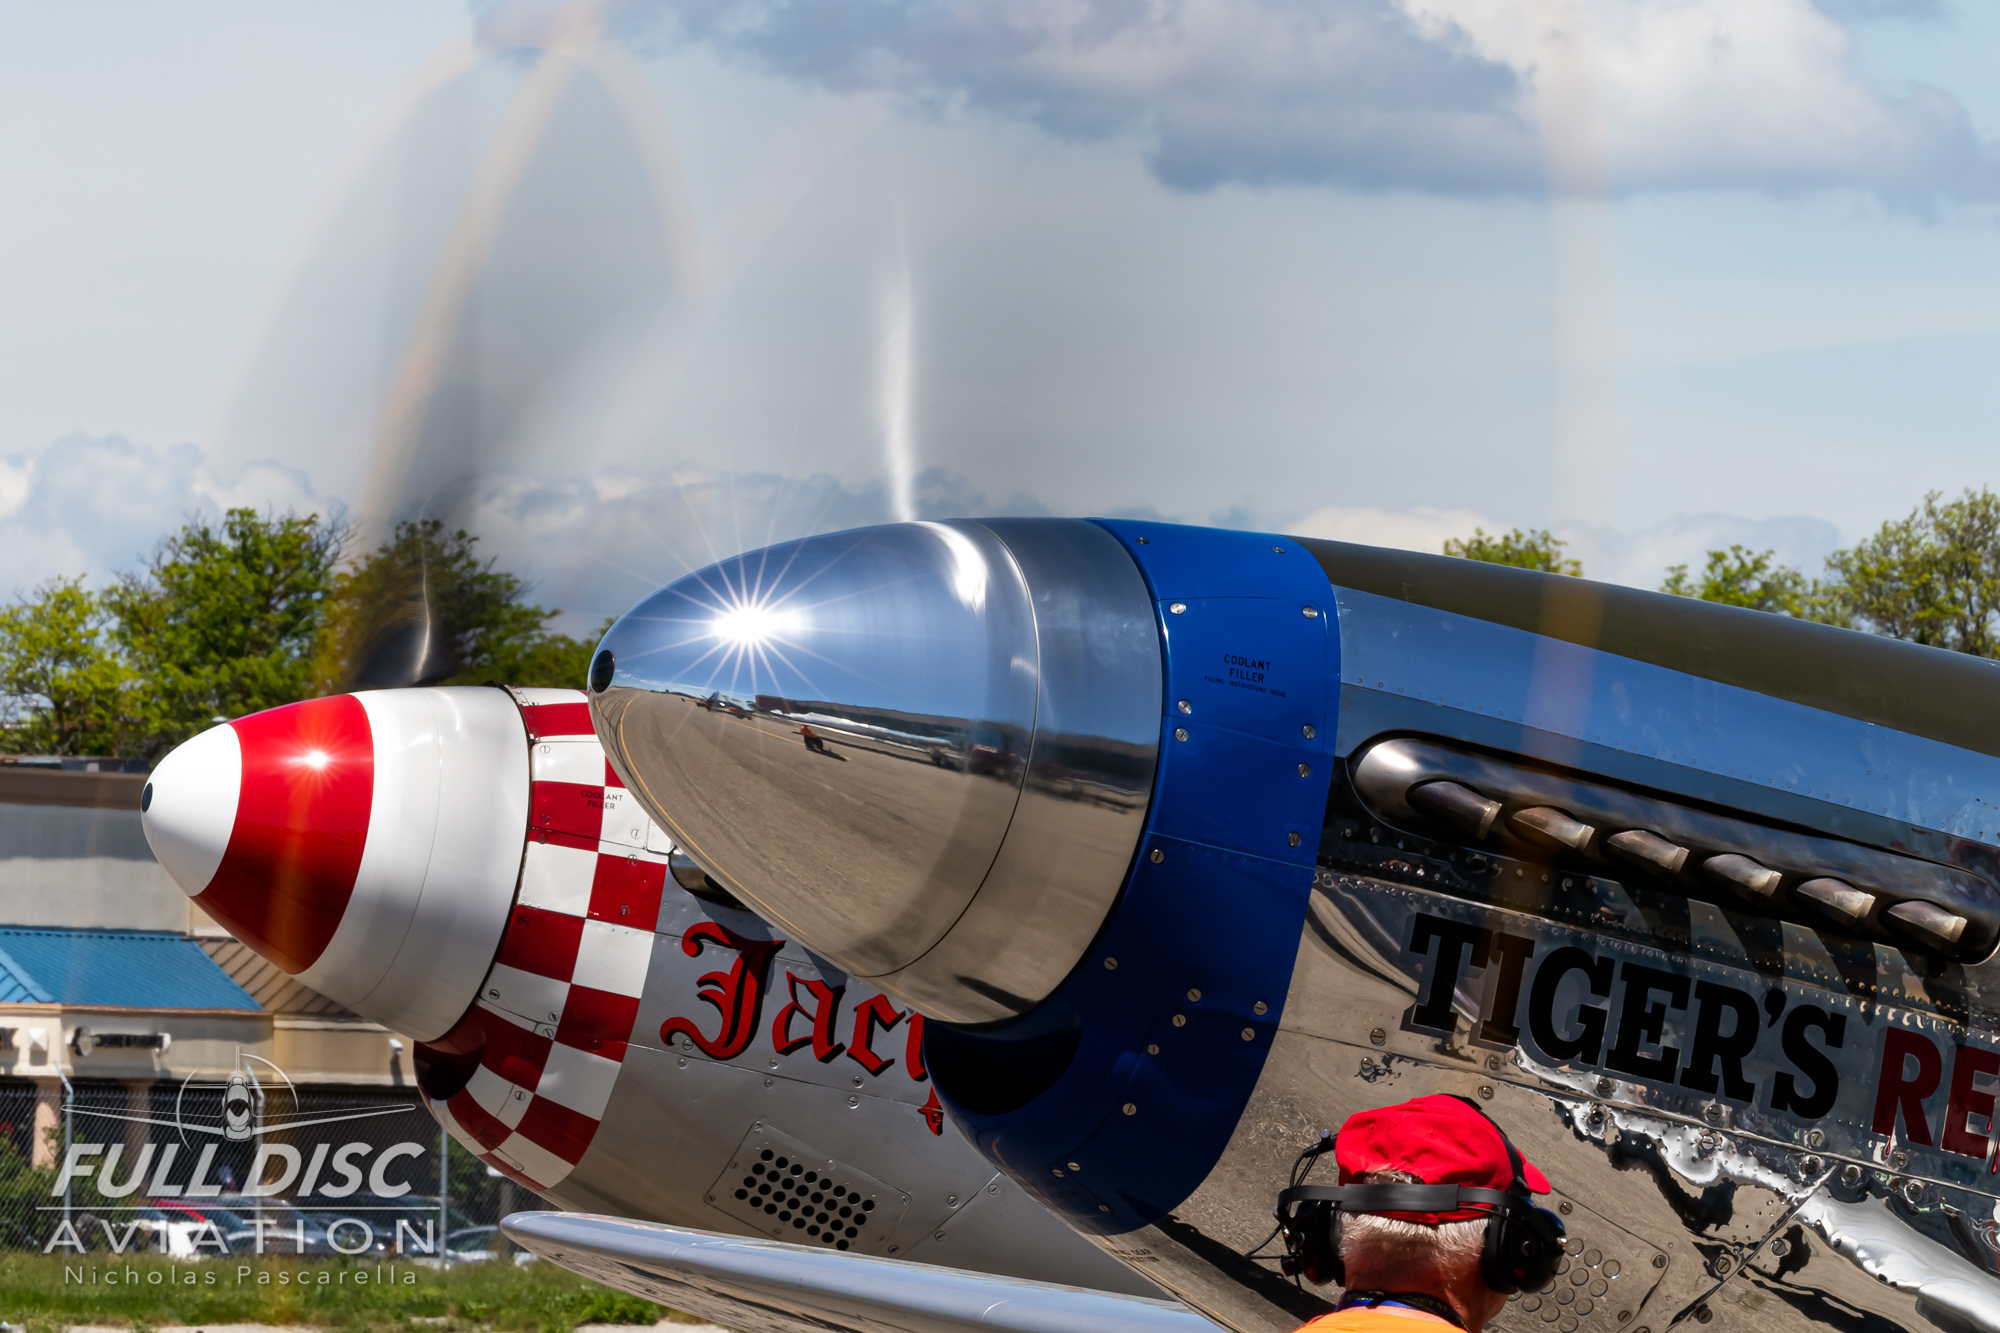 americanairpowermuseum_nicholaspascarella_nickpascarella_fulldiscaviation_legendsofairpower2019_aviation_warbird_p51_mustang_spinners.jpg